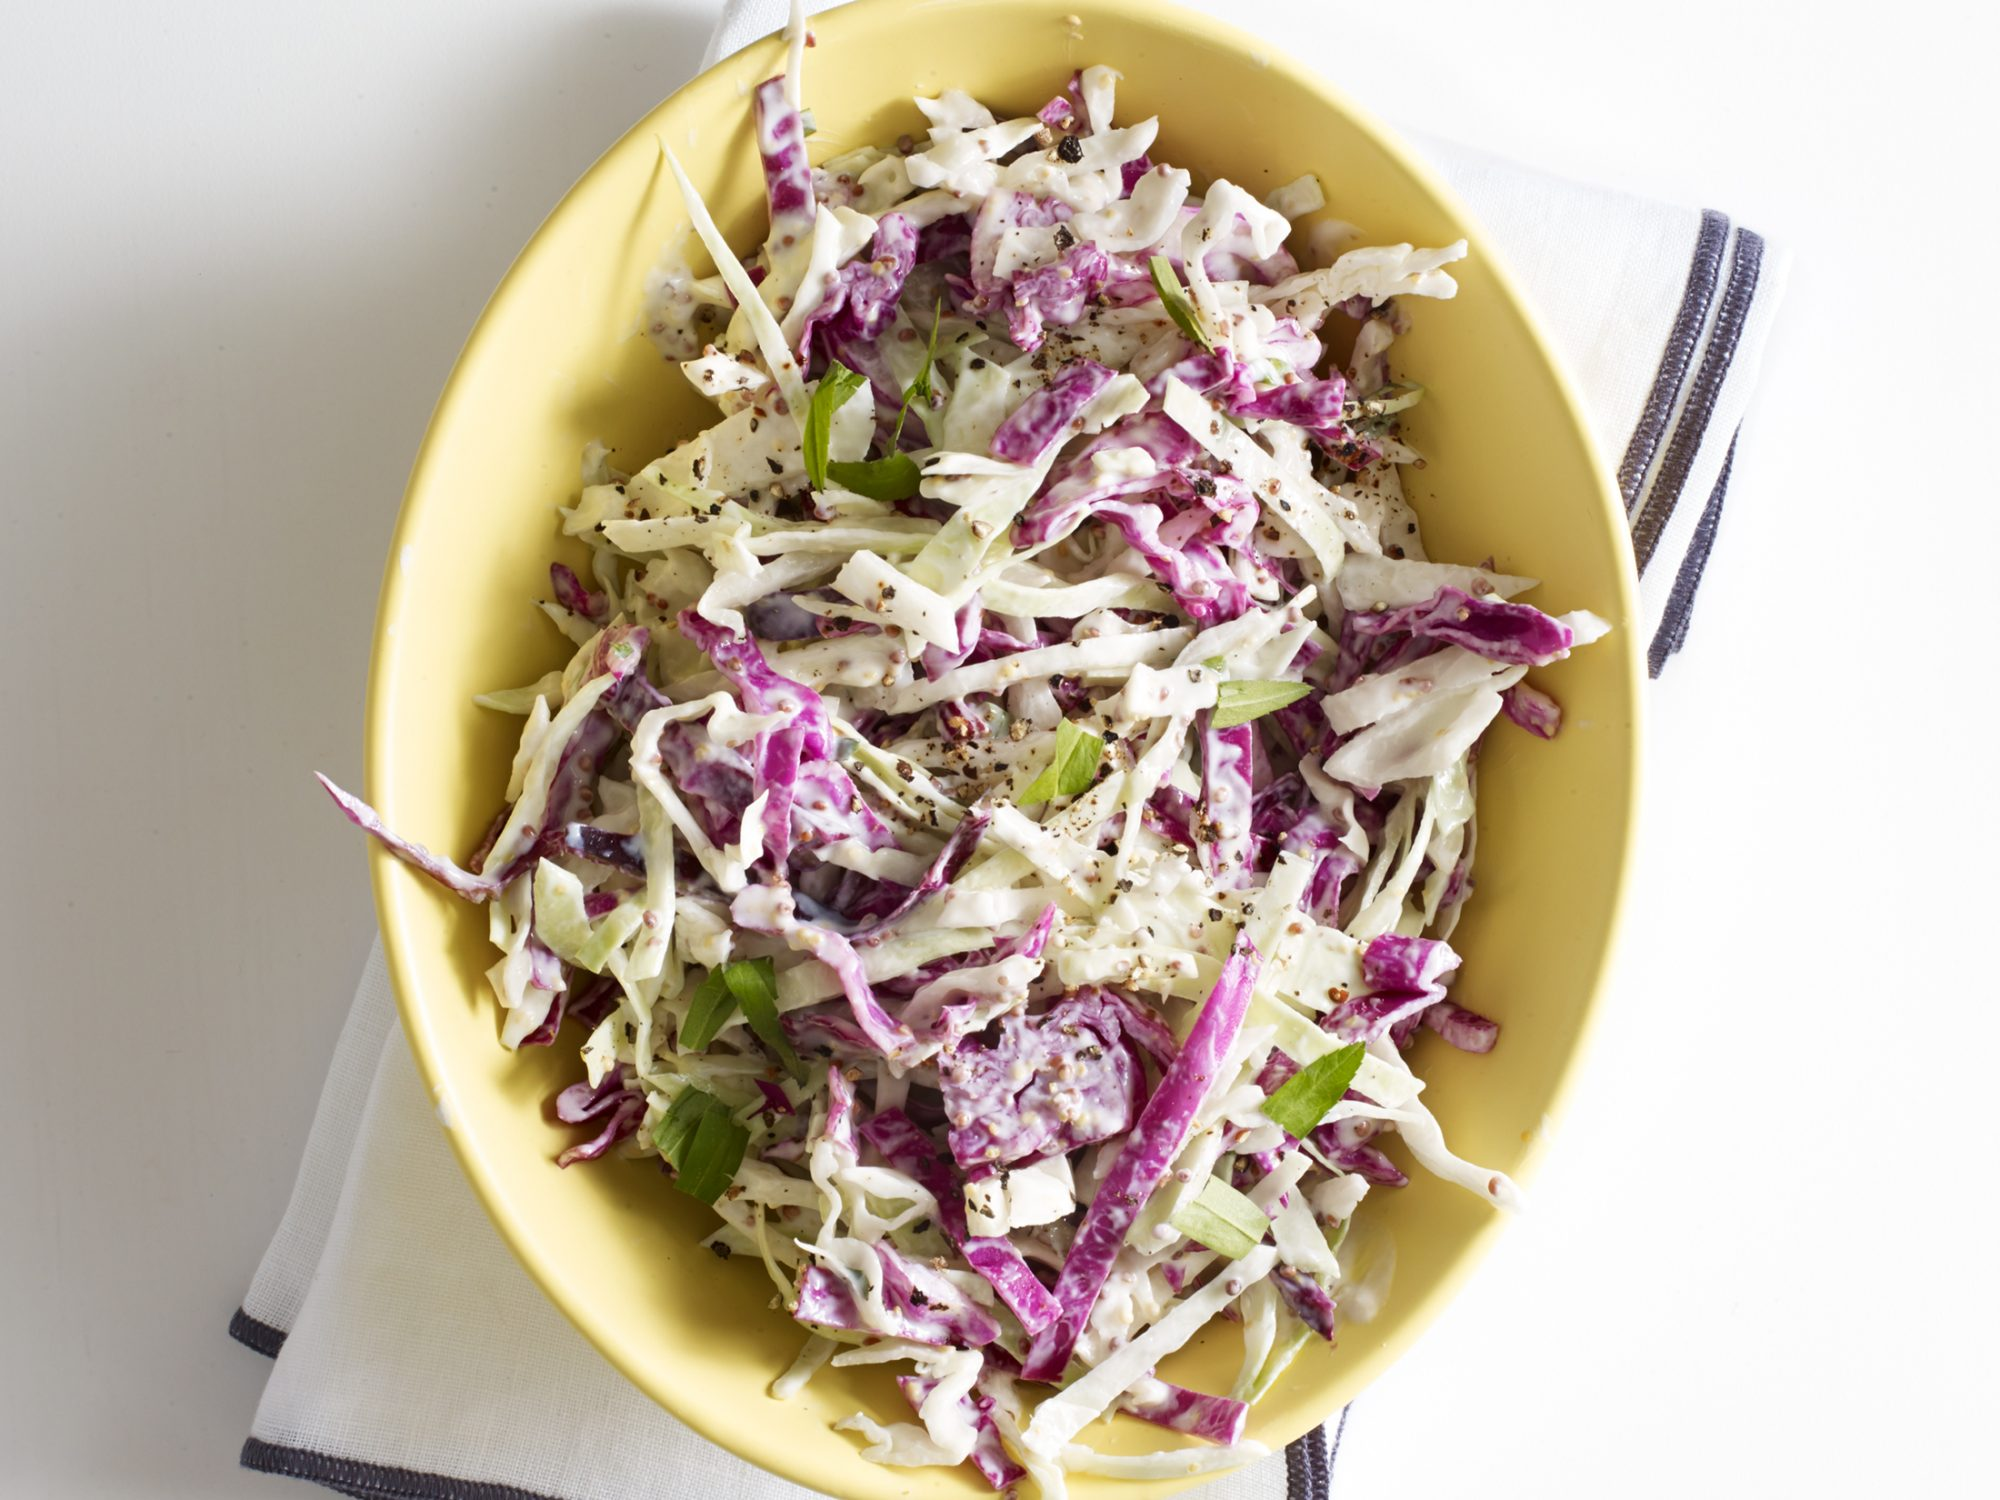 Shredded Cabbage Slaw